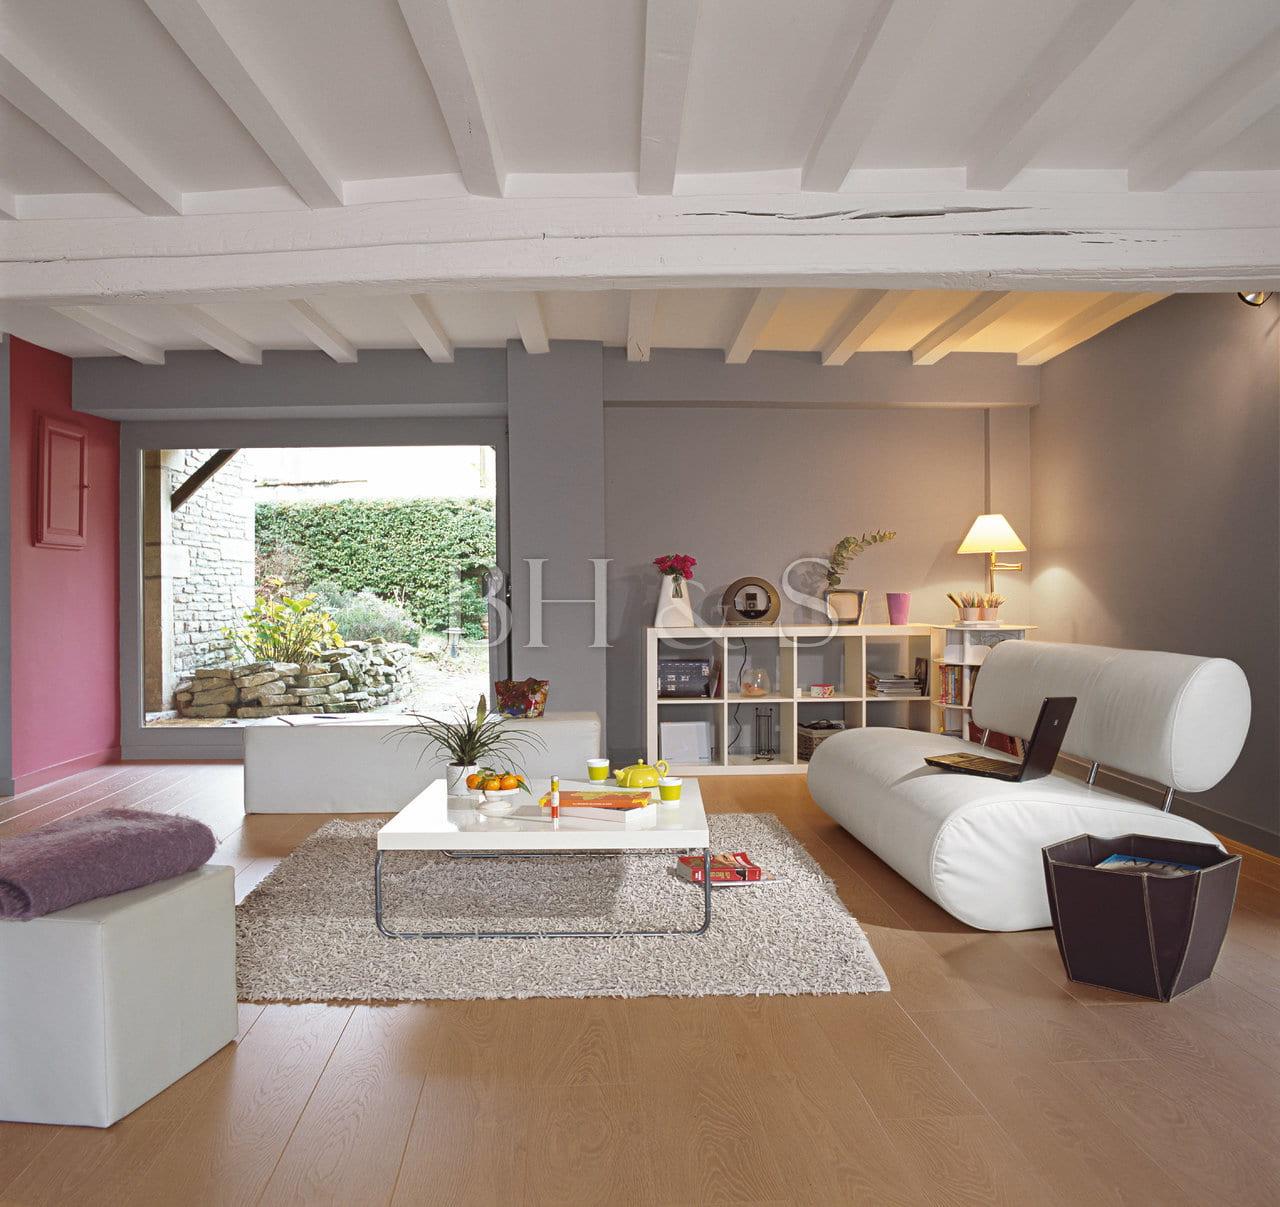 Projet global rénovation maison de village - Colin - Burgundy Home ...